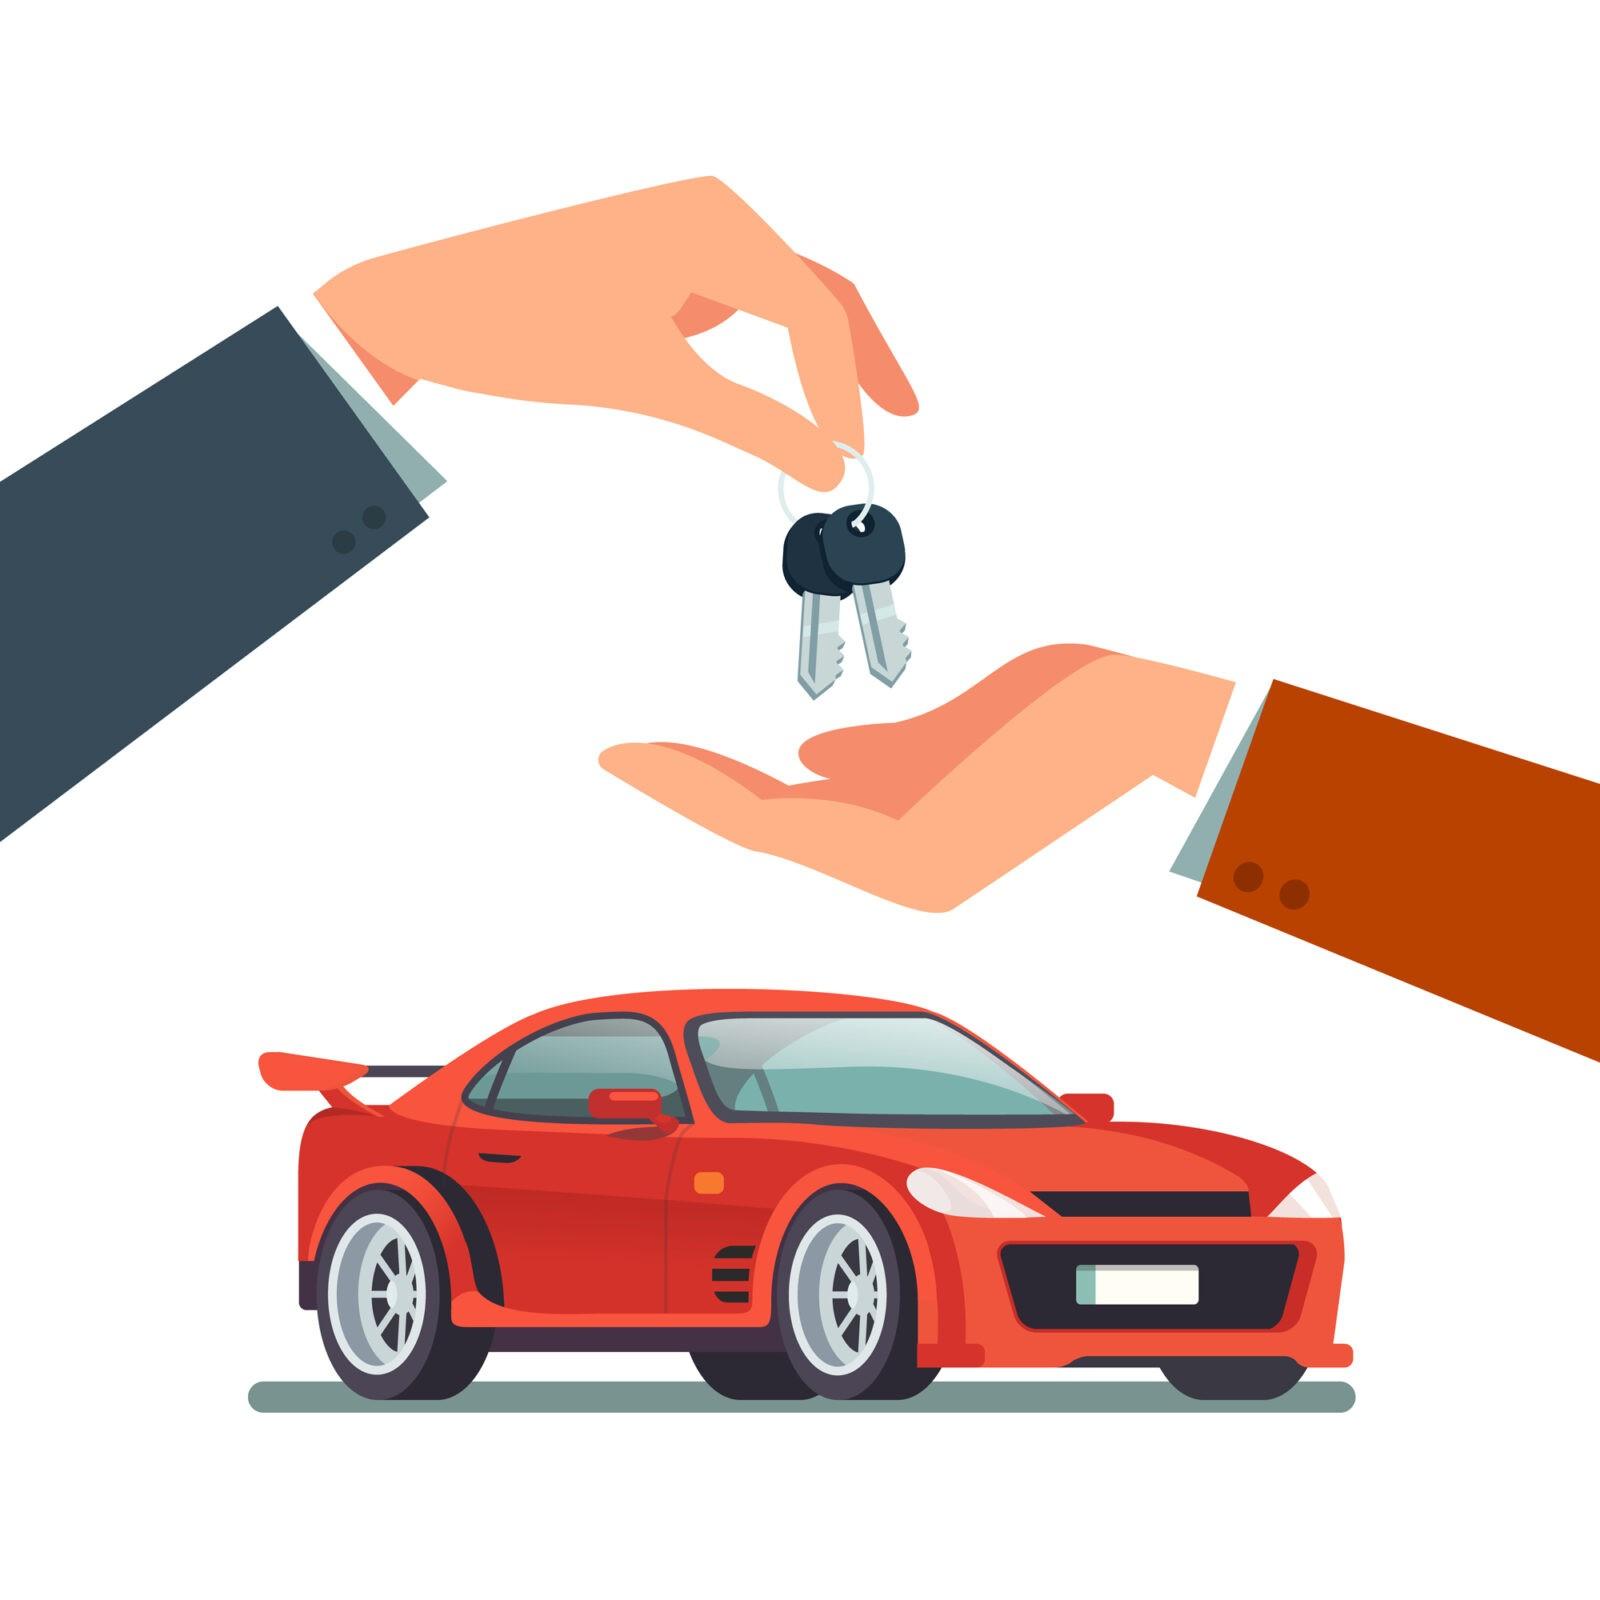 нужен ли блог автосалону?